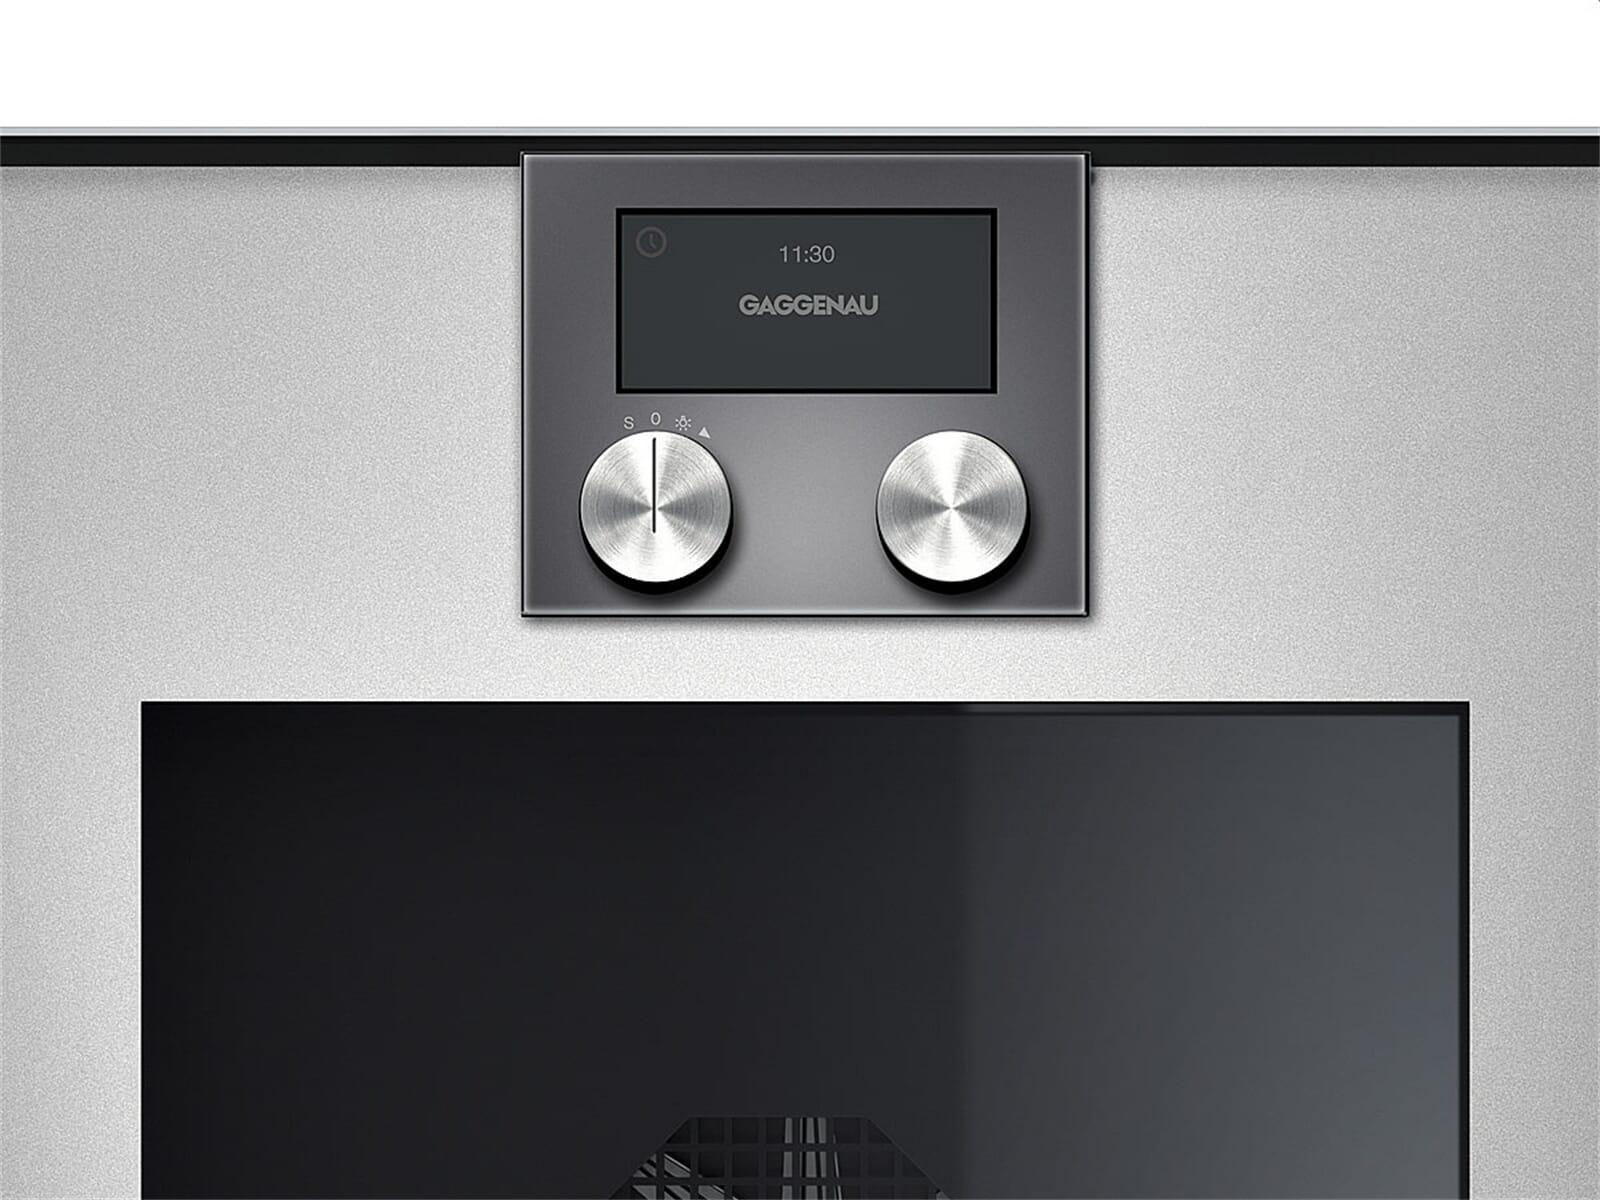 gaggenau bop 220 111 backofen serie 200 metallic. Black Bedroom Furniture Sets. Home Design Ideas